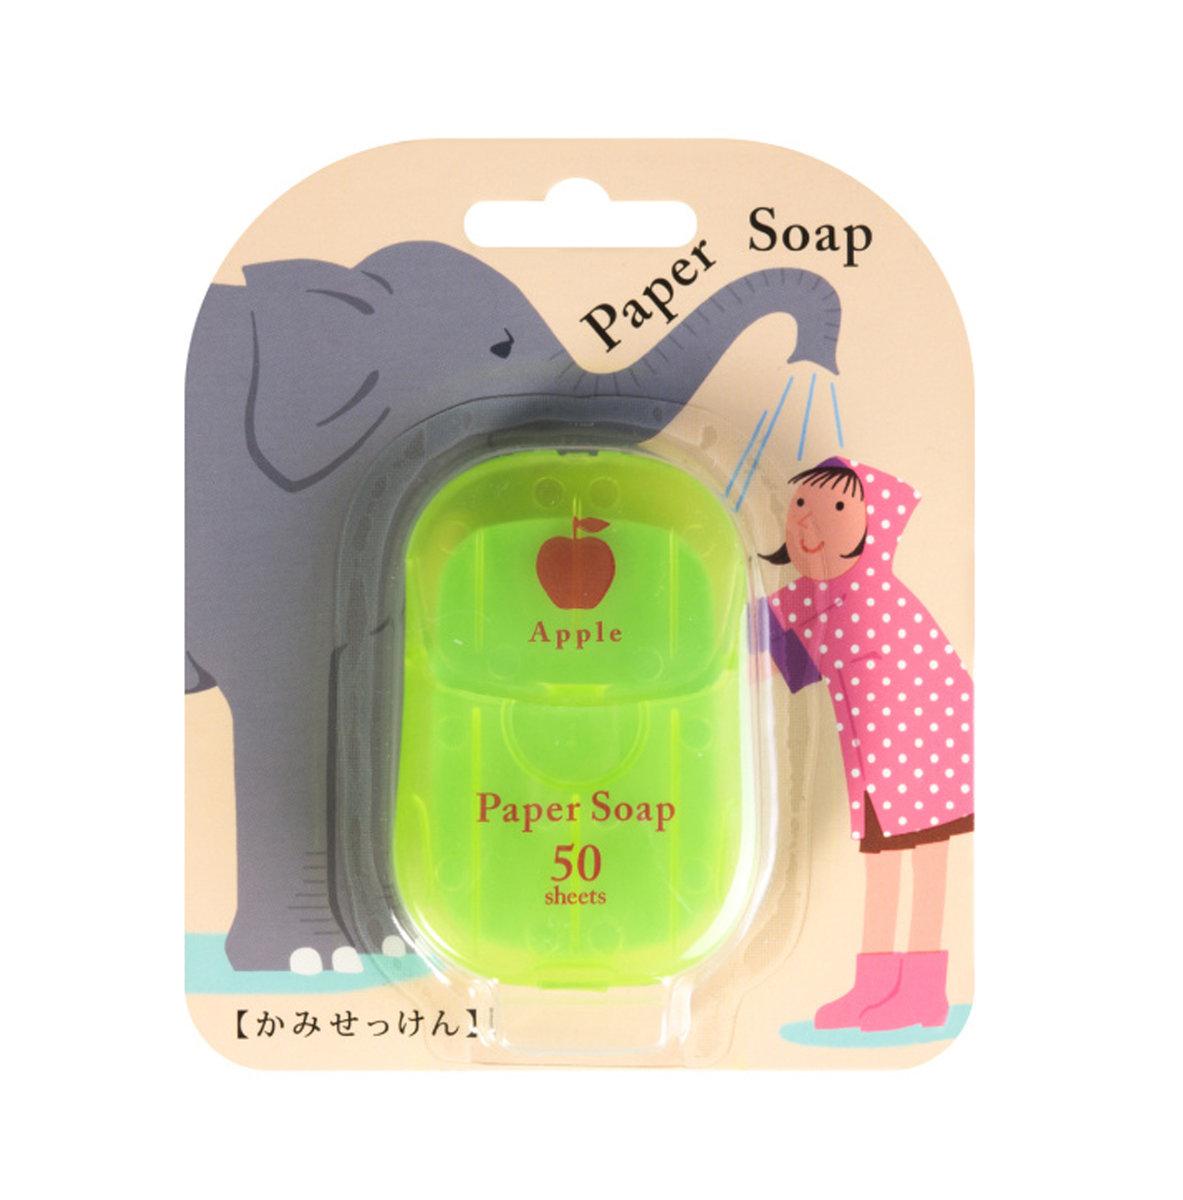 Paper Soap 肥皂紙香皂 (1盒50張) 蘋果味 (4975541027716)